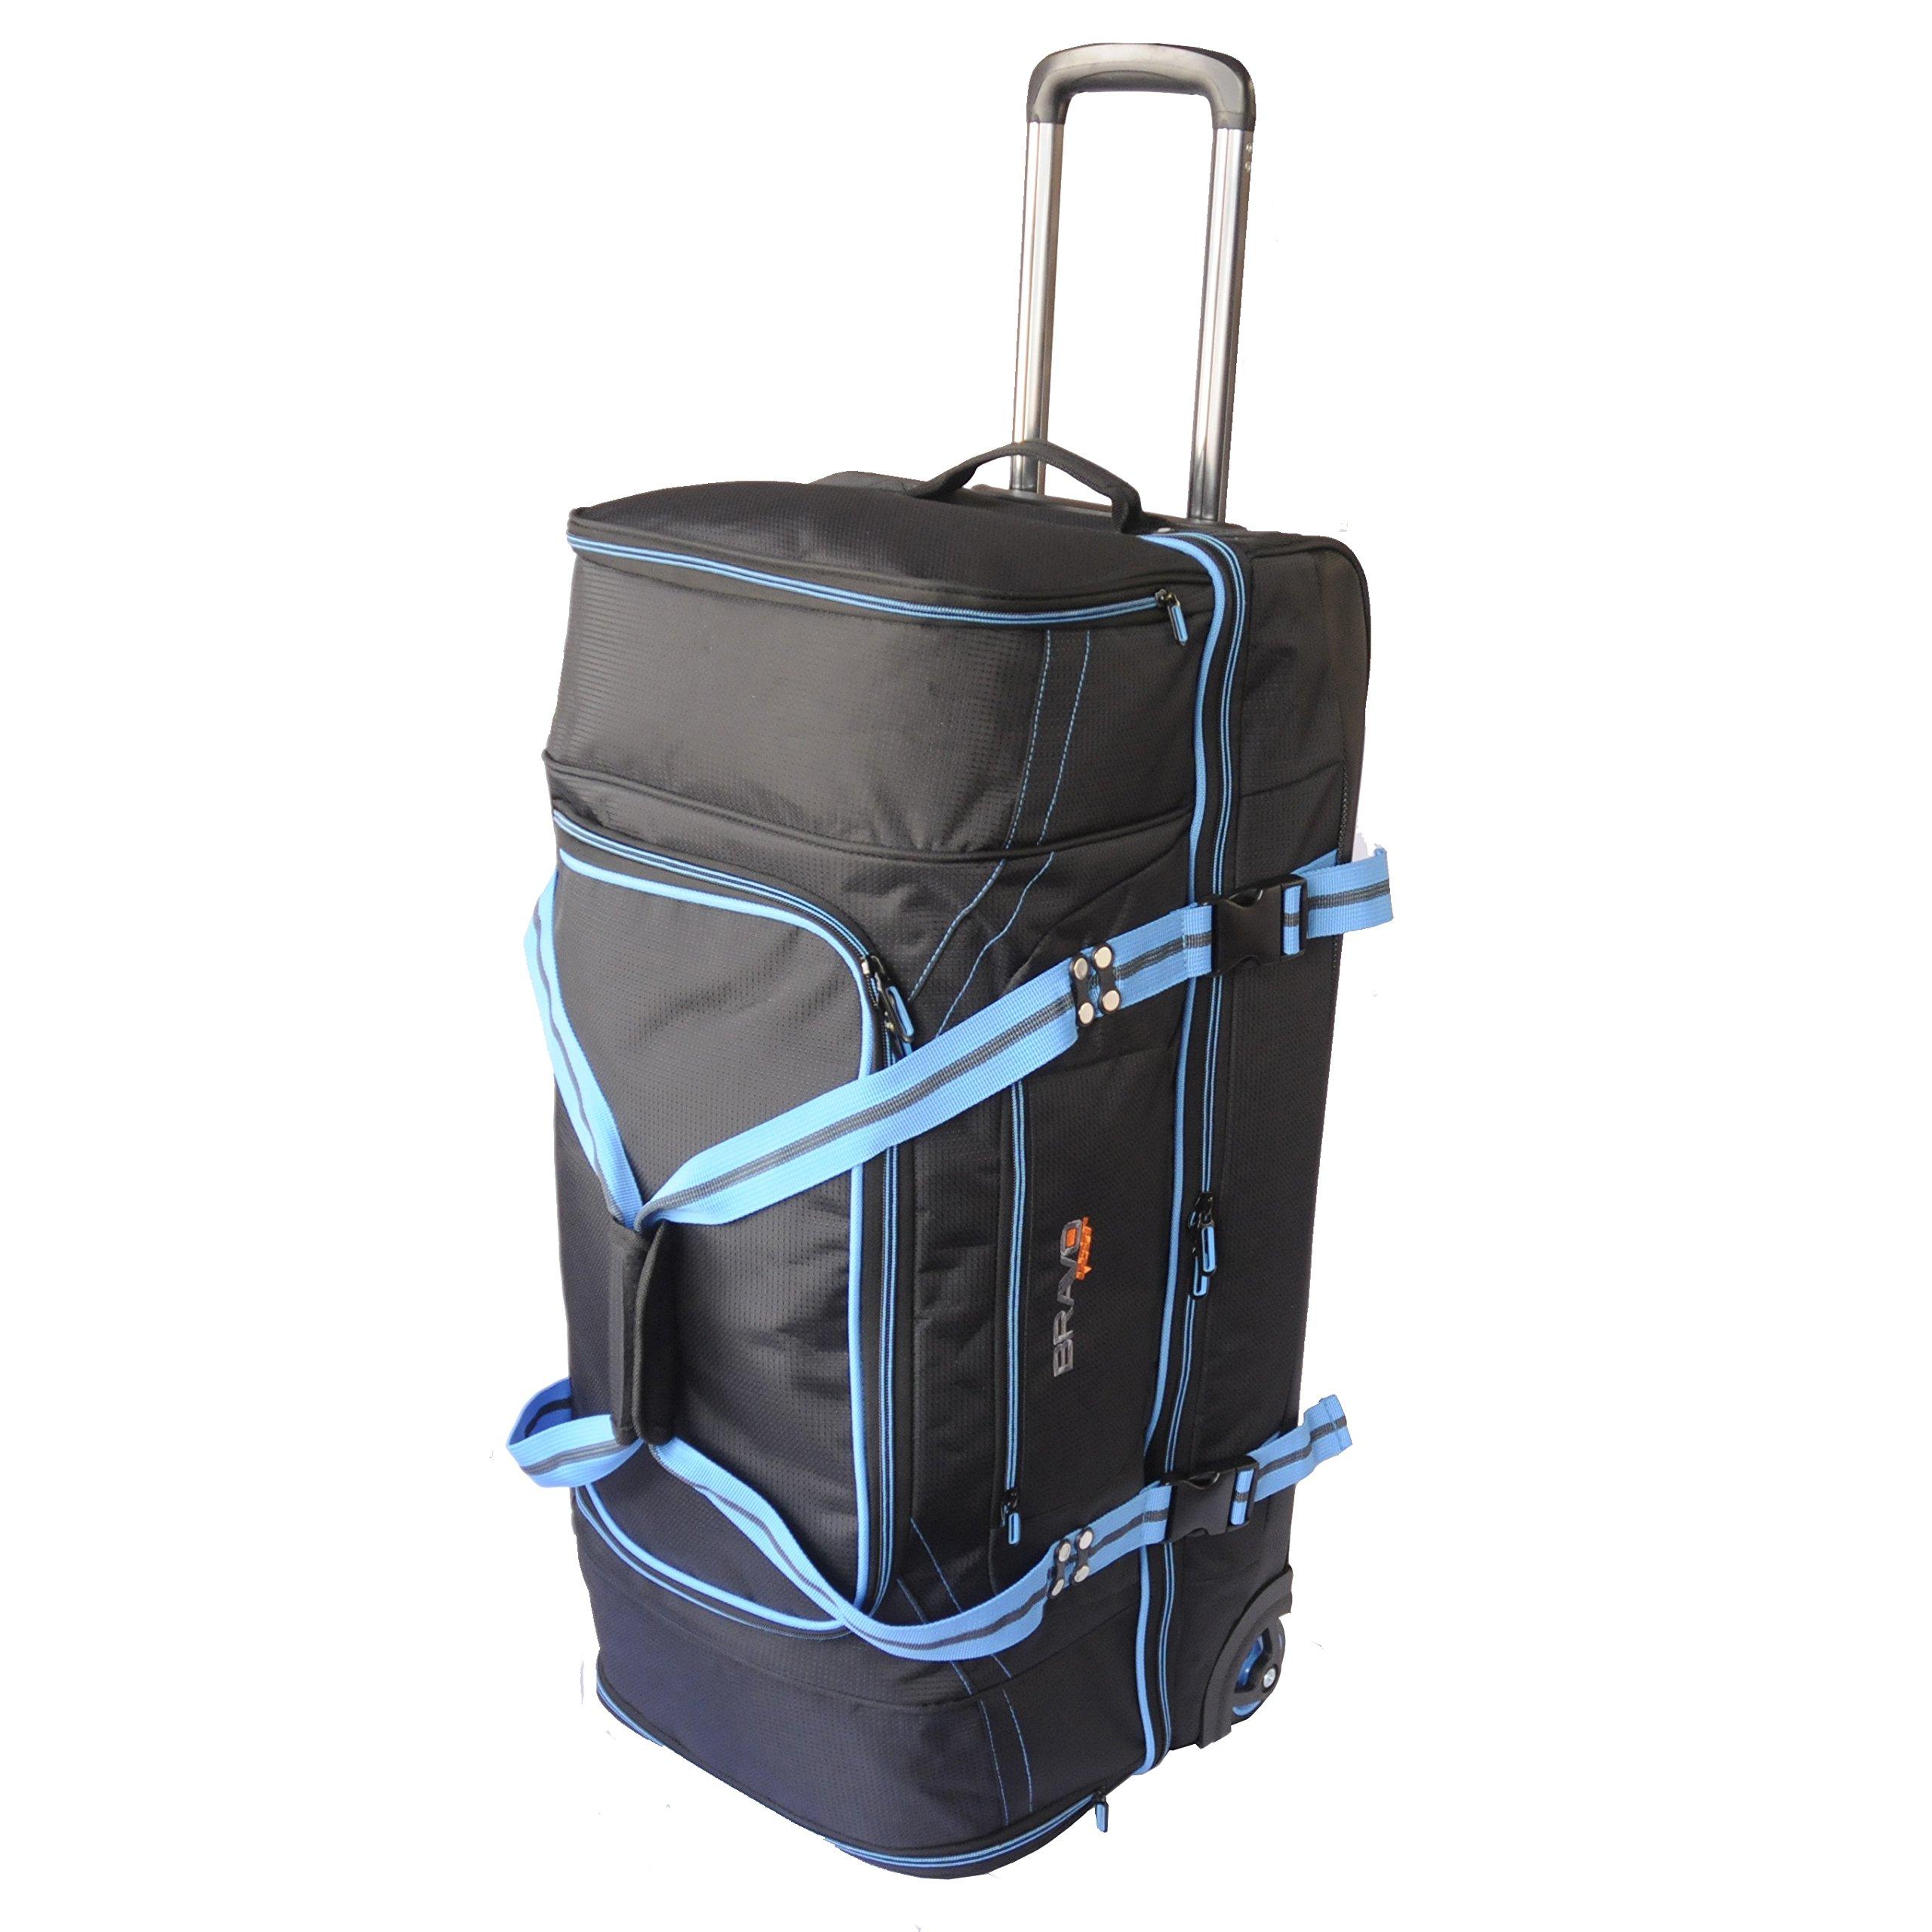 Bravo Gear 30 Inch Rolling Upright Duffel Bag Blue Travel Carry On Luggage Large Camp XL Duffle Bag TSA by Xena